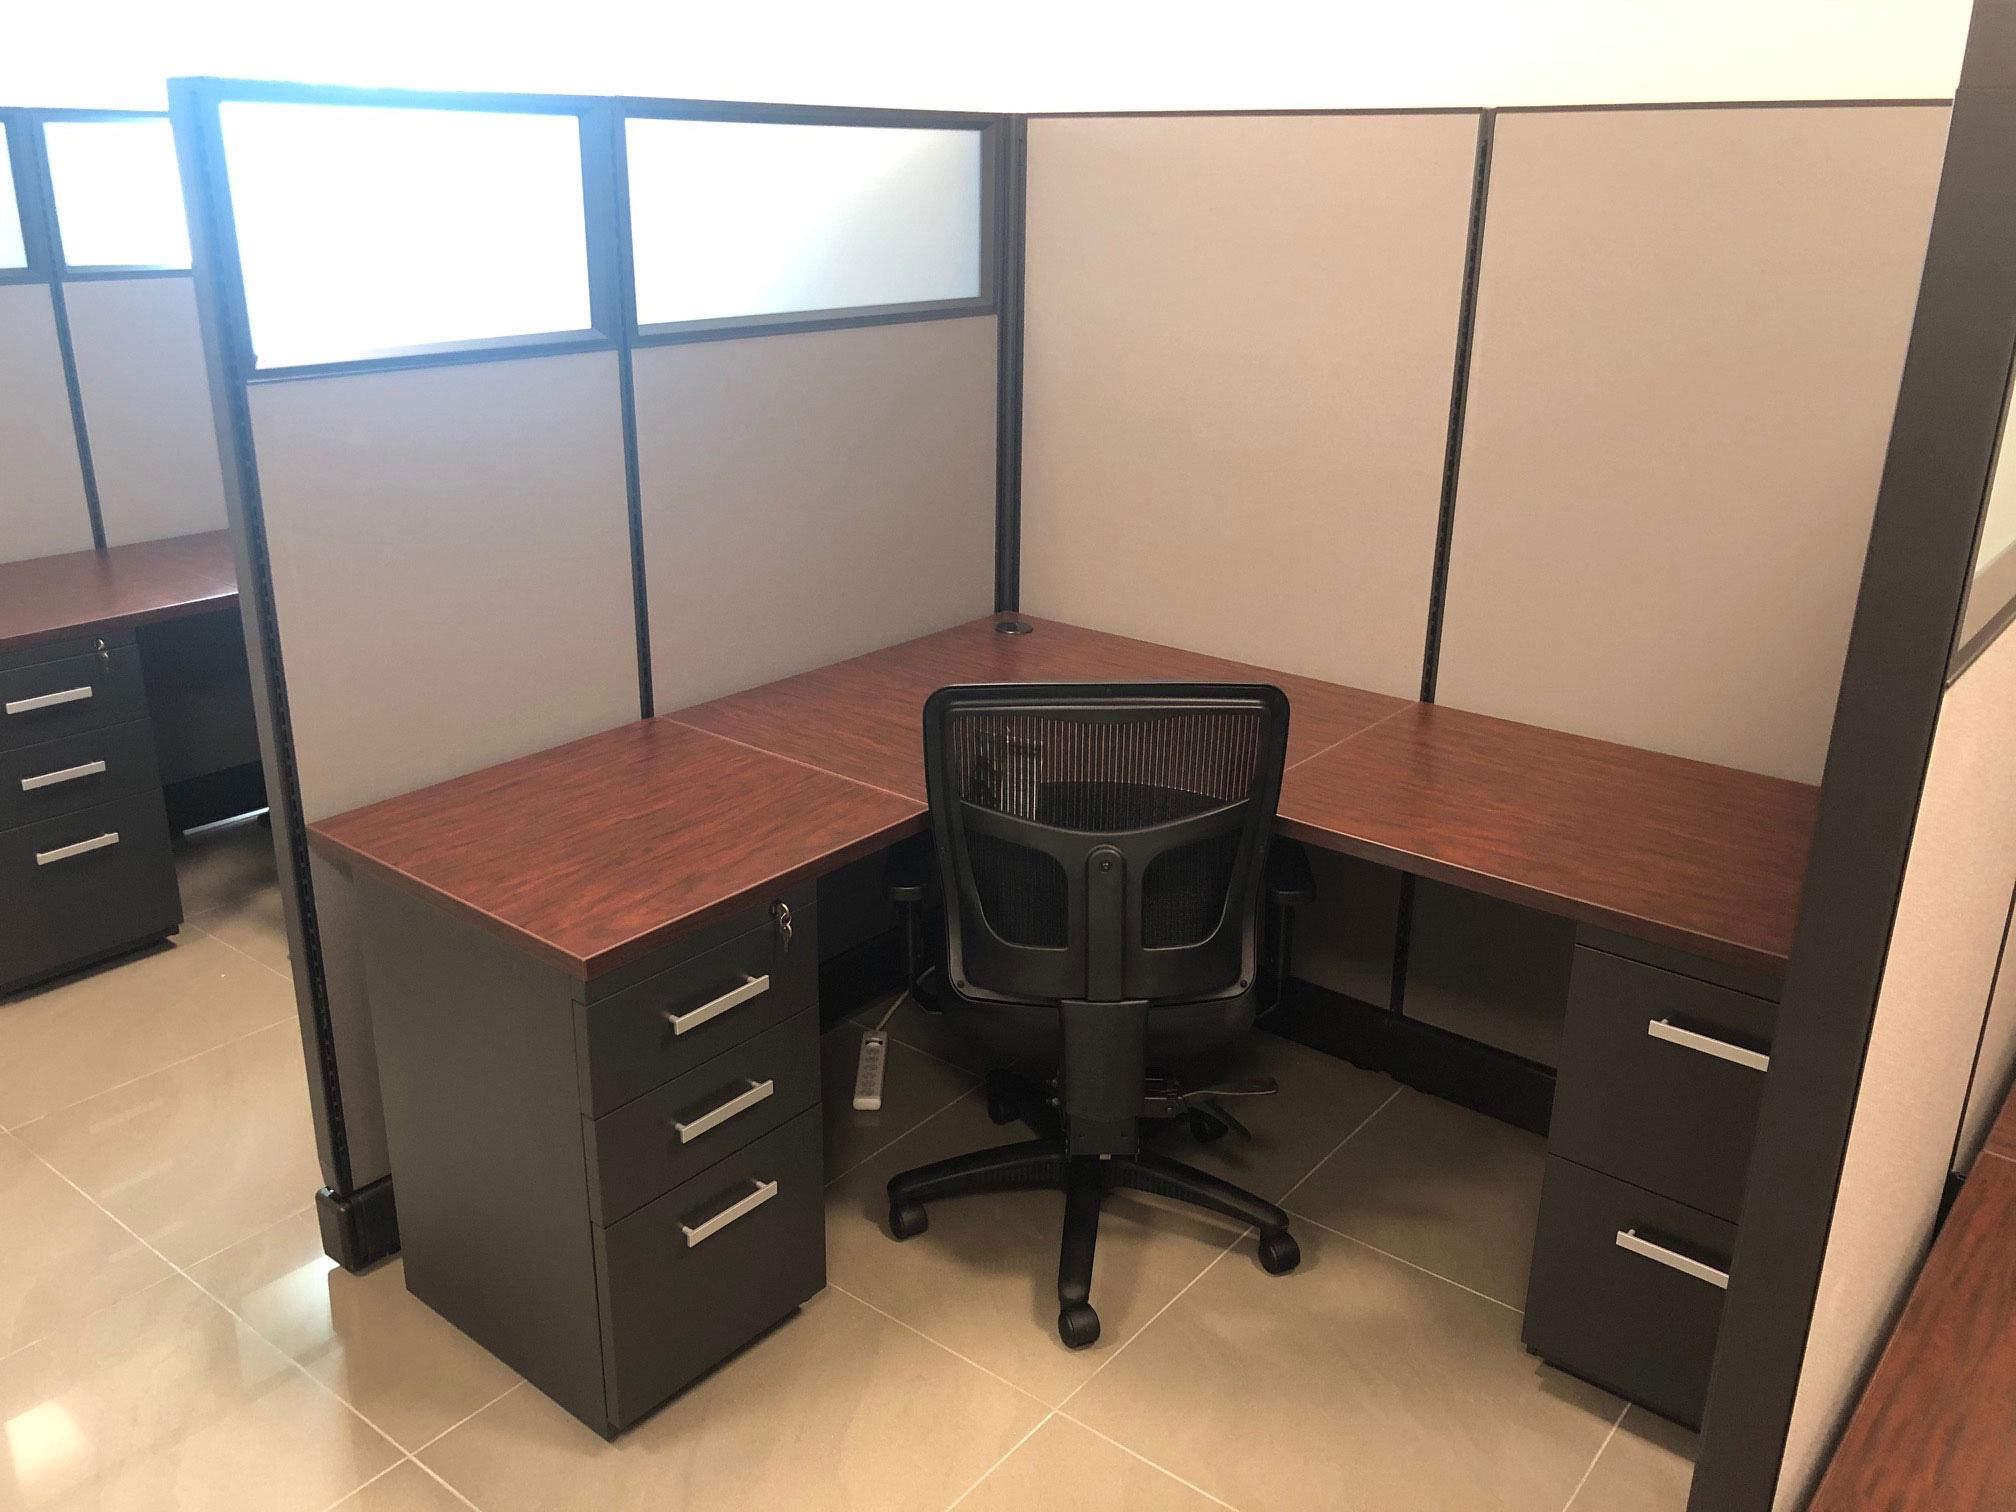 office-cubicle-furniture-suppliers-in-apopka-florida-2.jpg